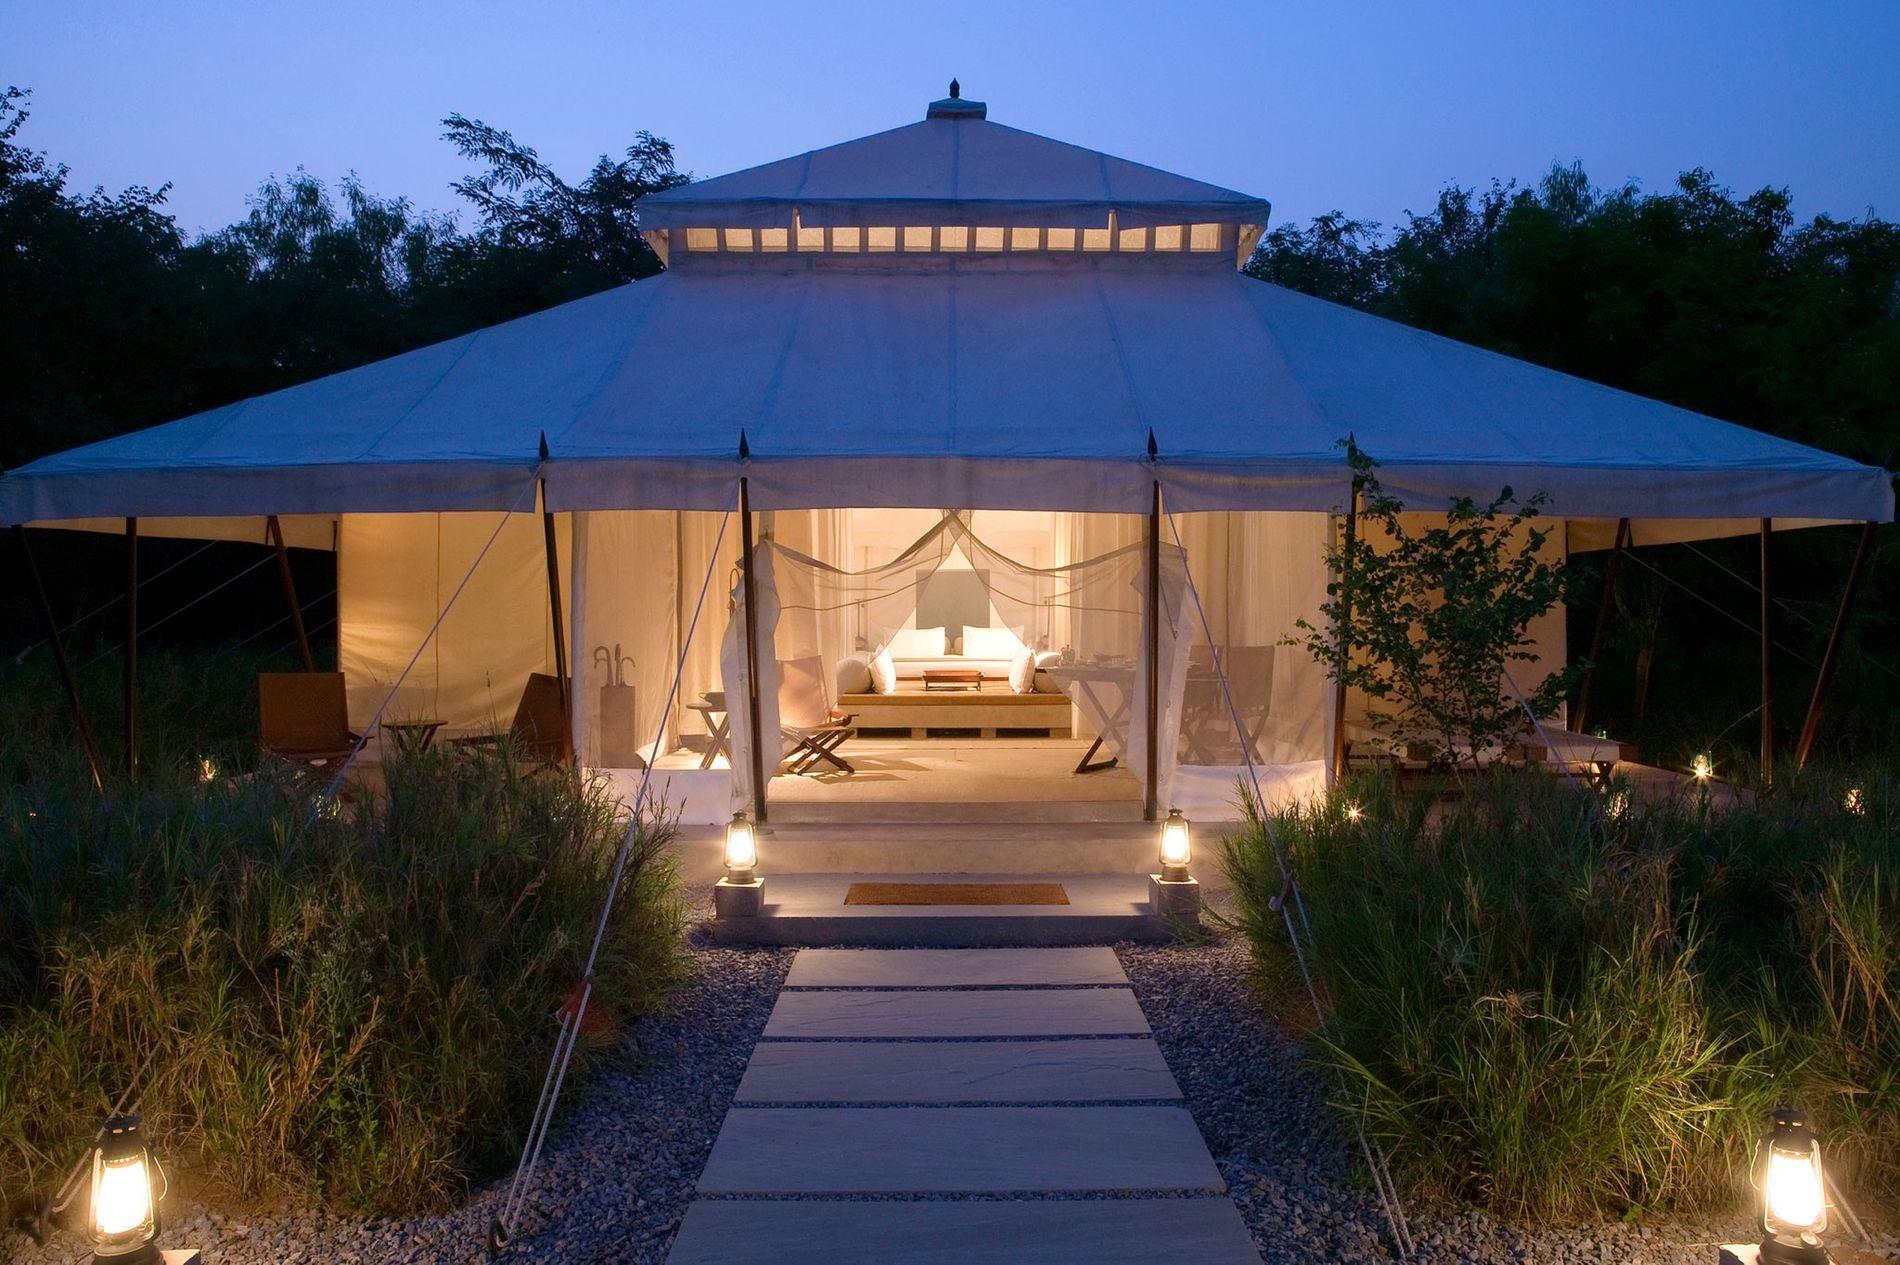 Resort Aman-i-Khás, na Índia, fica dentro do Parque Nacional Ranthambore